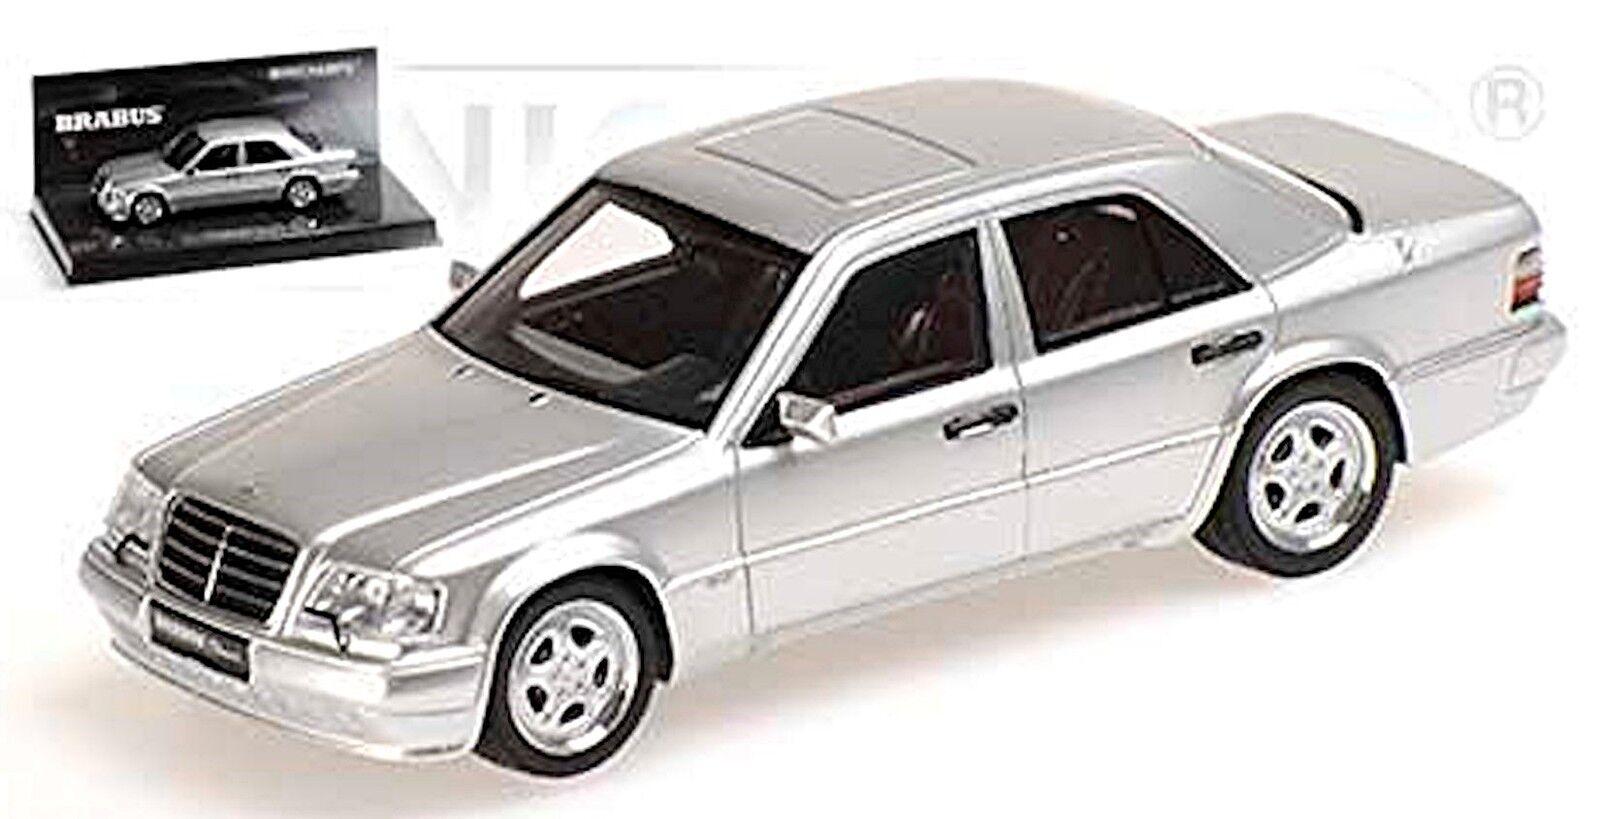 BRABUS 6,5 V8 - 1993 MERCEDES 500E W124 silver silver métallique 1 43 Minichamps